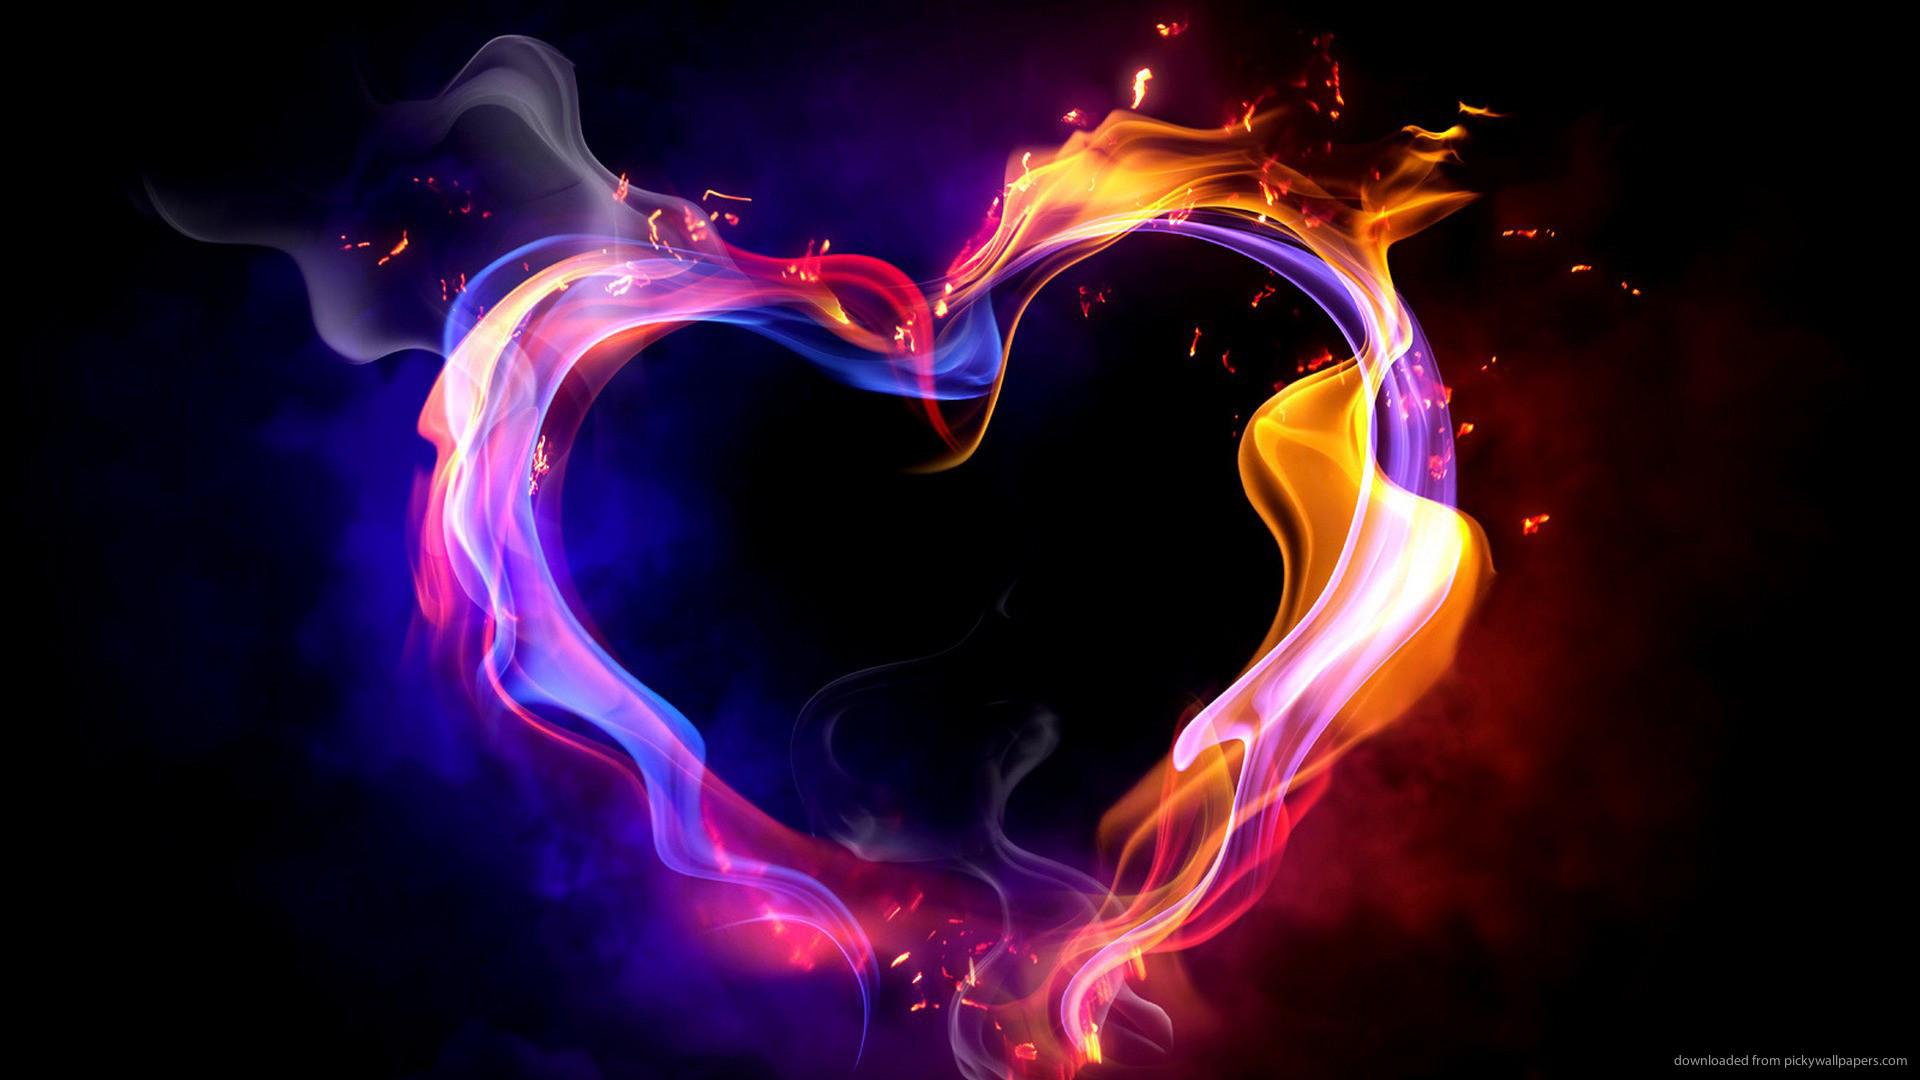 Fire Heart Wallpaper: Find best latest Fire Heart Wallpaper in HD for your  PC desktop background & mobile phones.